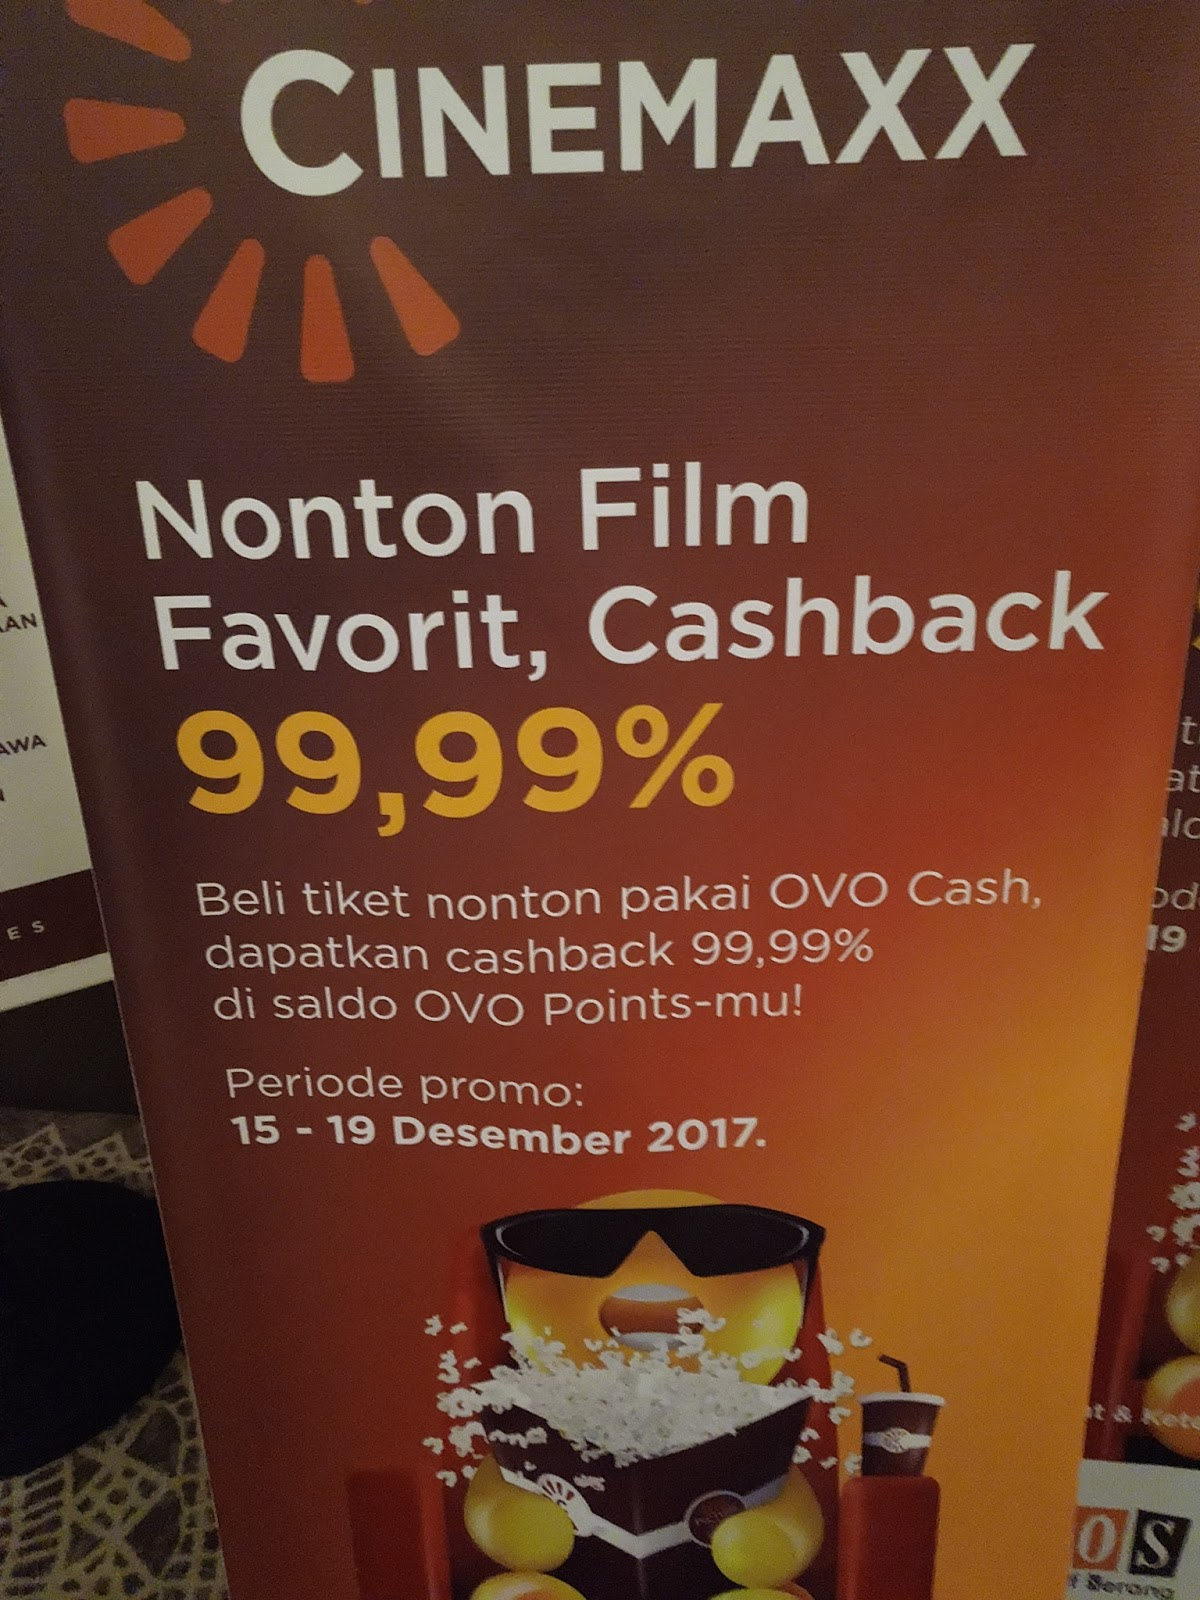 Cinemaxx Serang Syariah Cinemaxx Serang Syariah